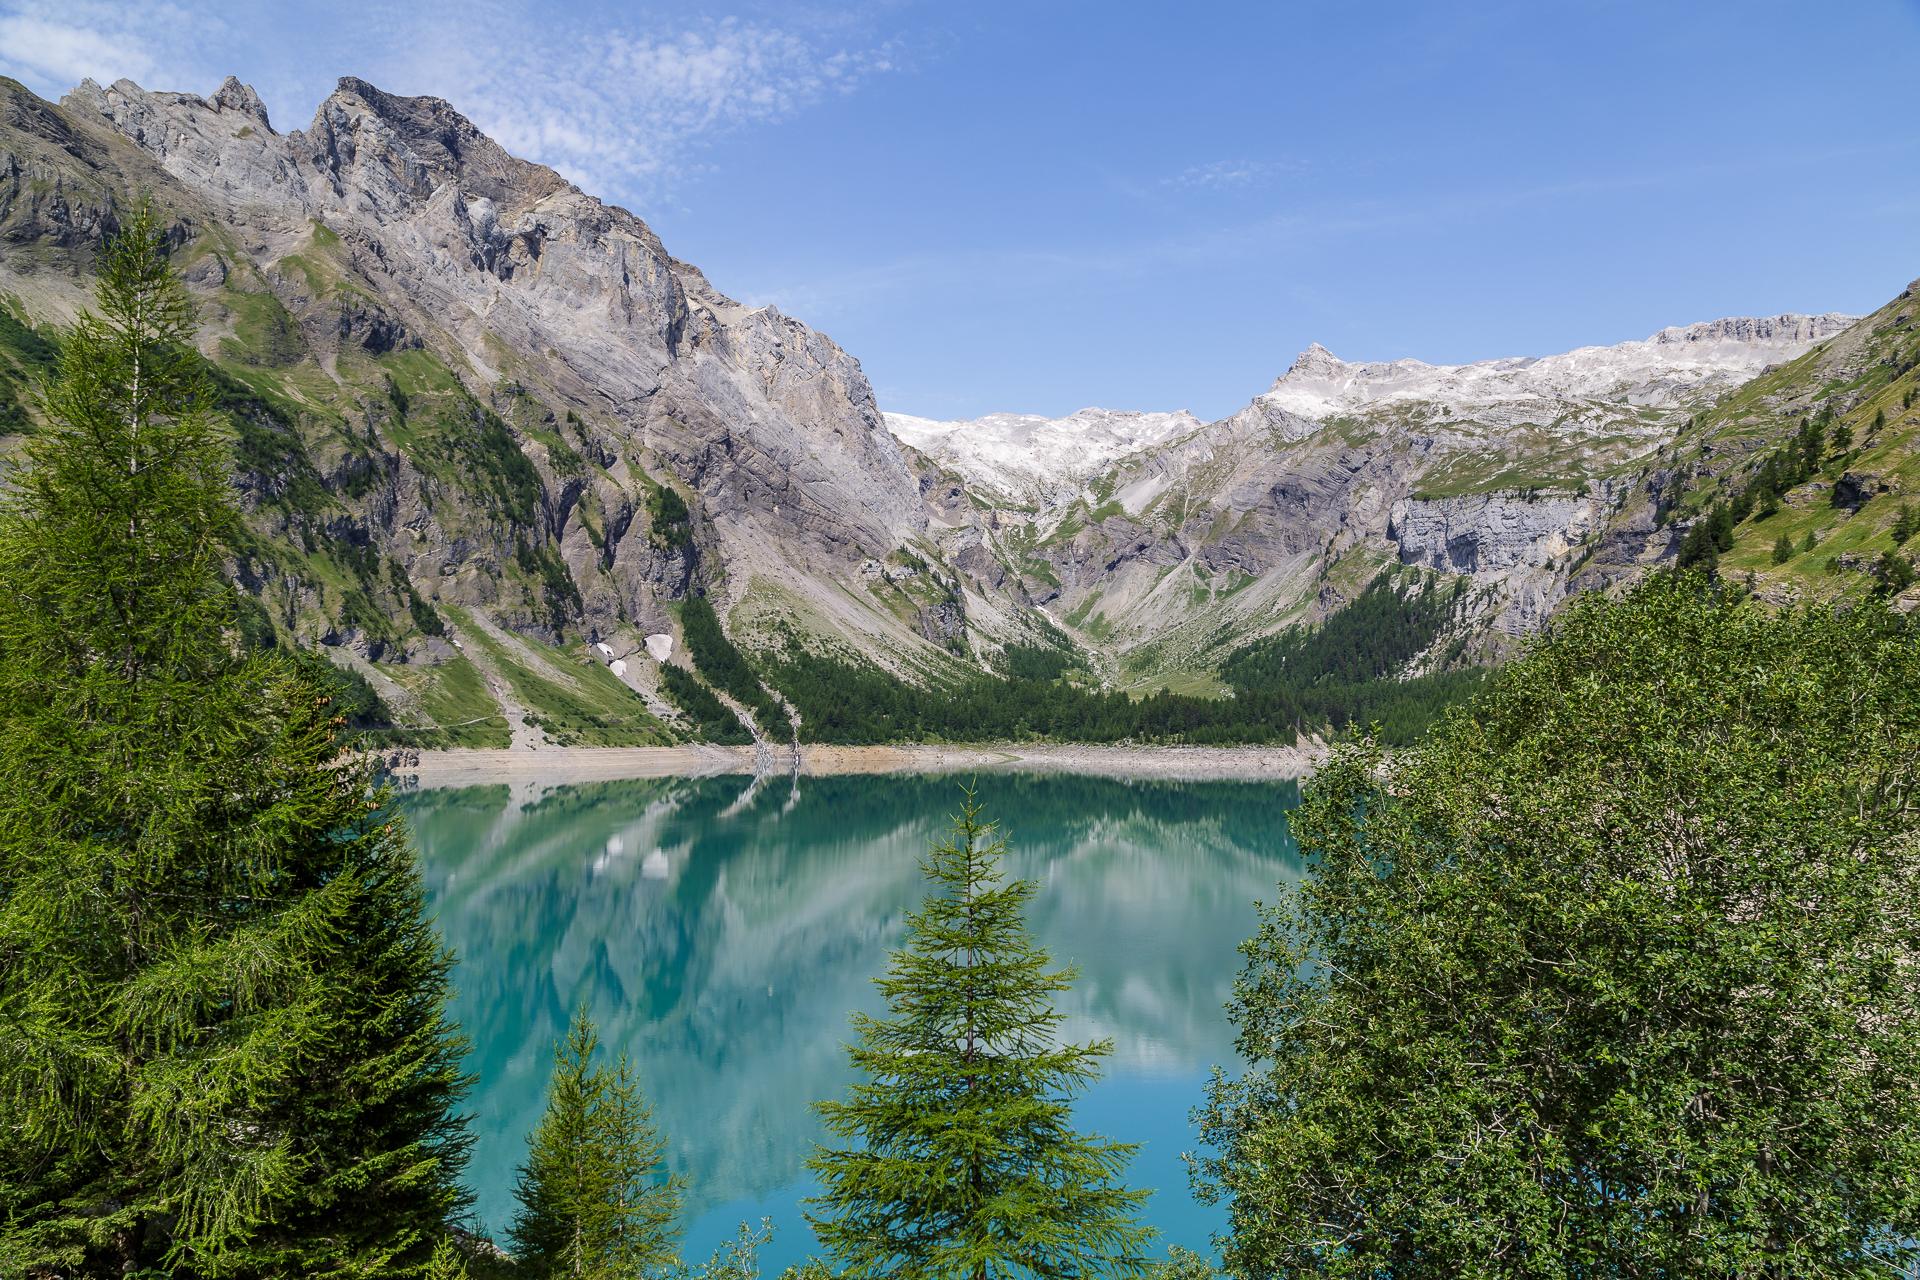 Lac-de-Tseuzier-Aussicht